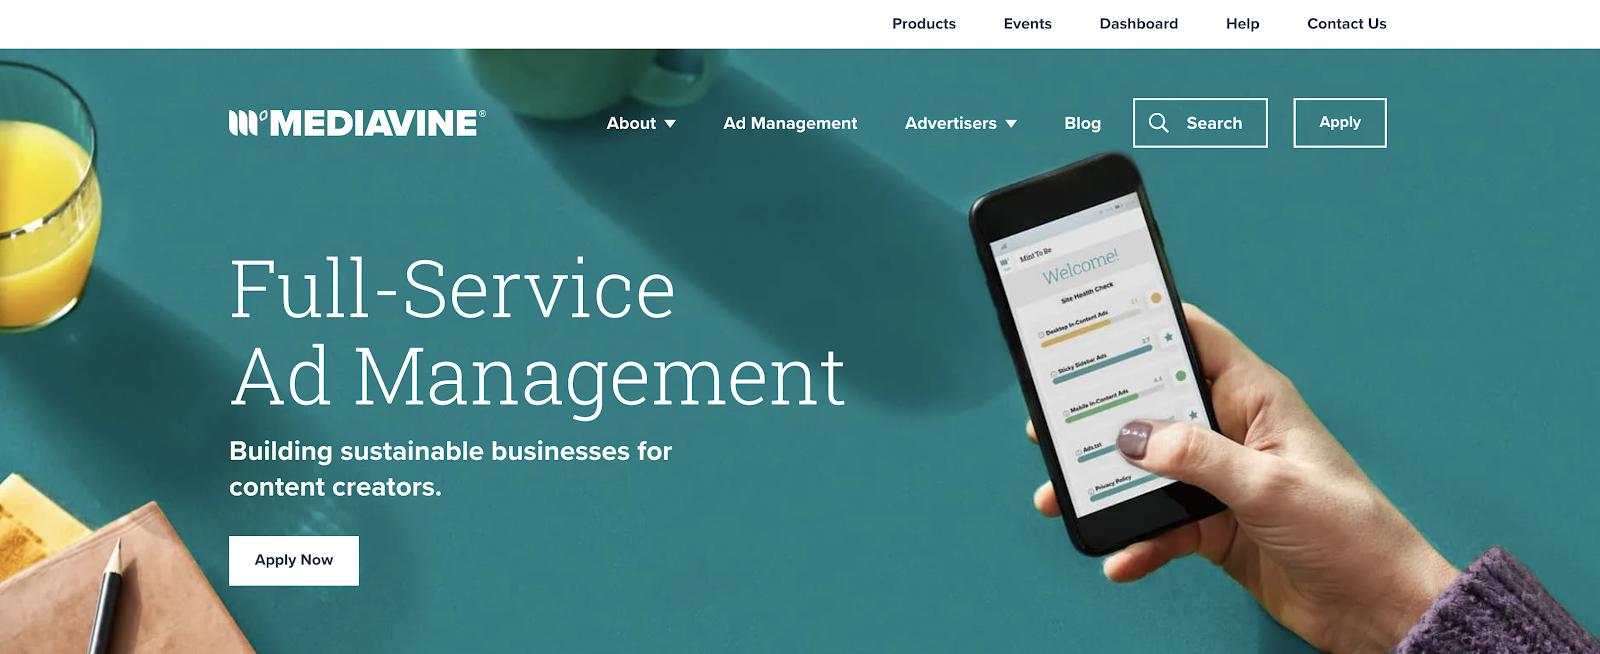 Mediavine Blog Advertising Network (Homepage Screenshot)